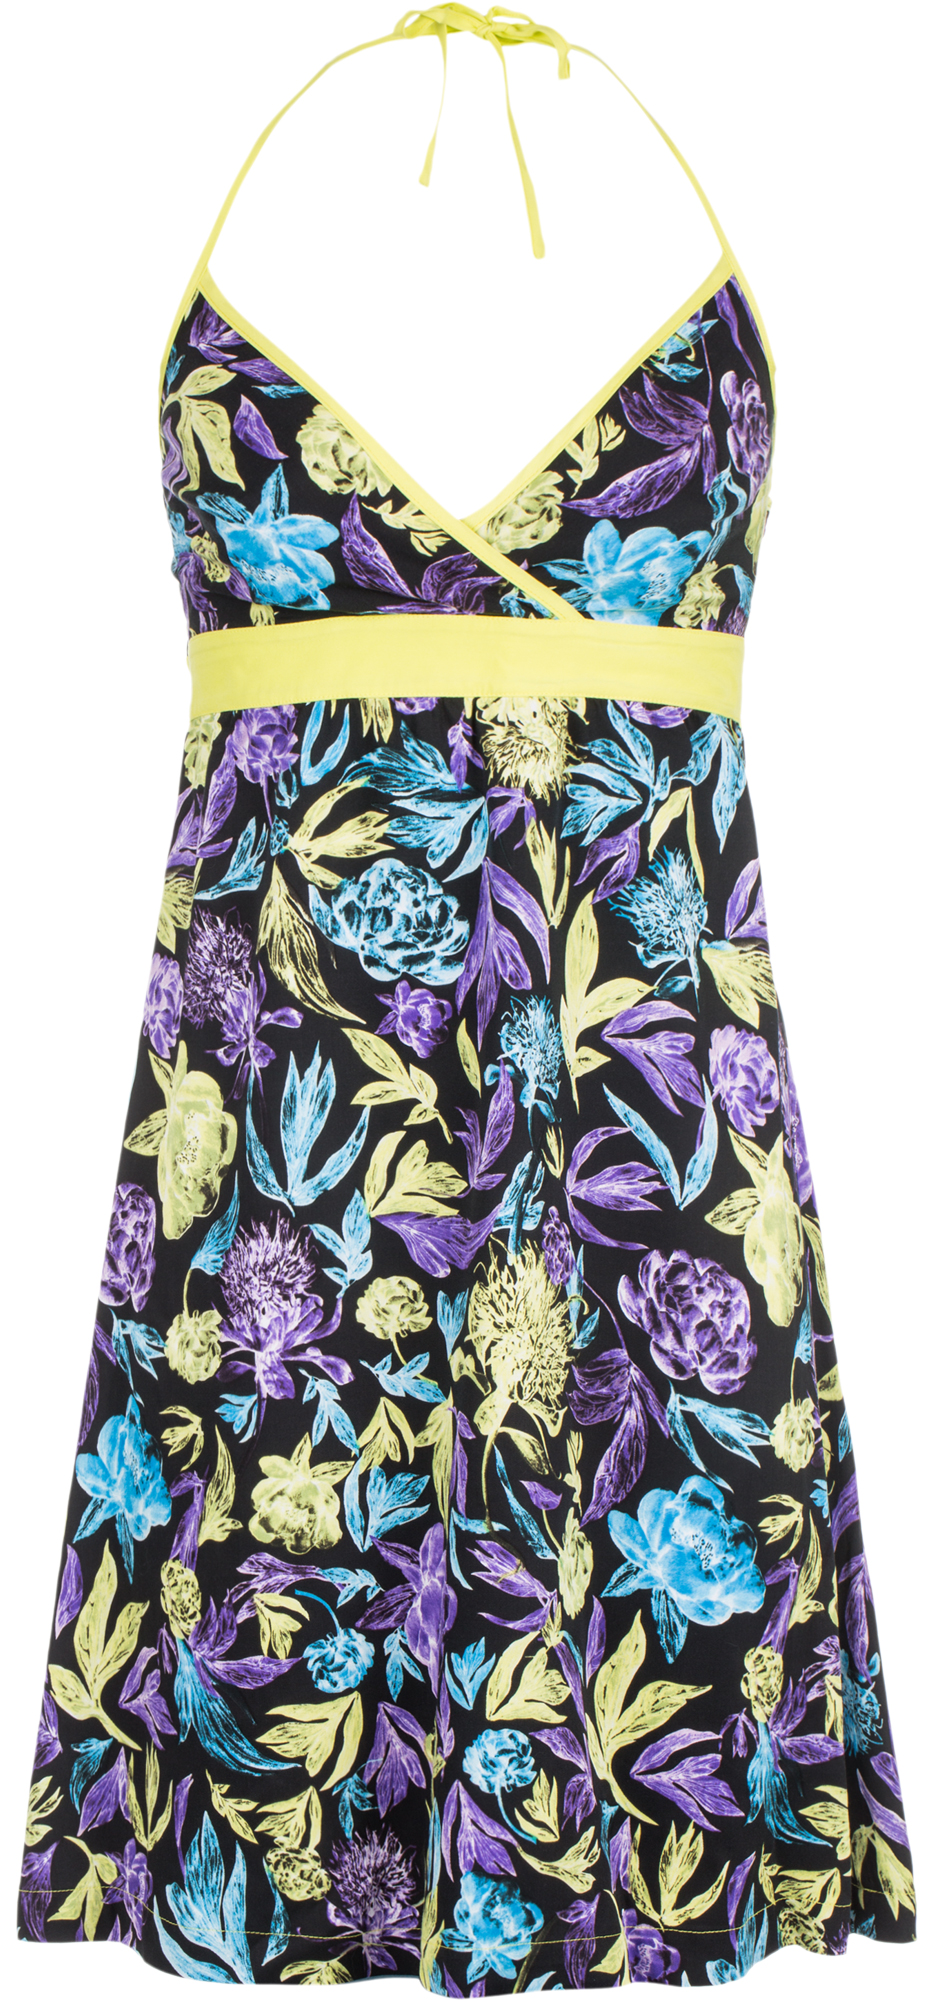 Termit Платье женское Termit, размер 44